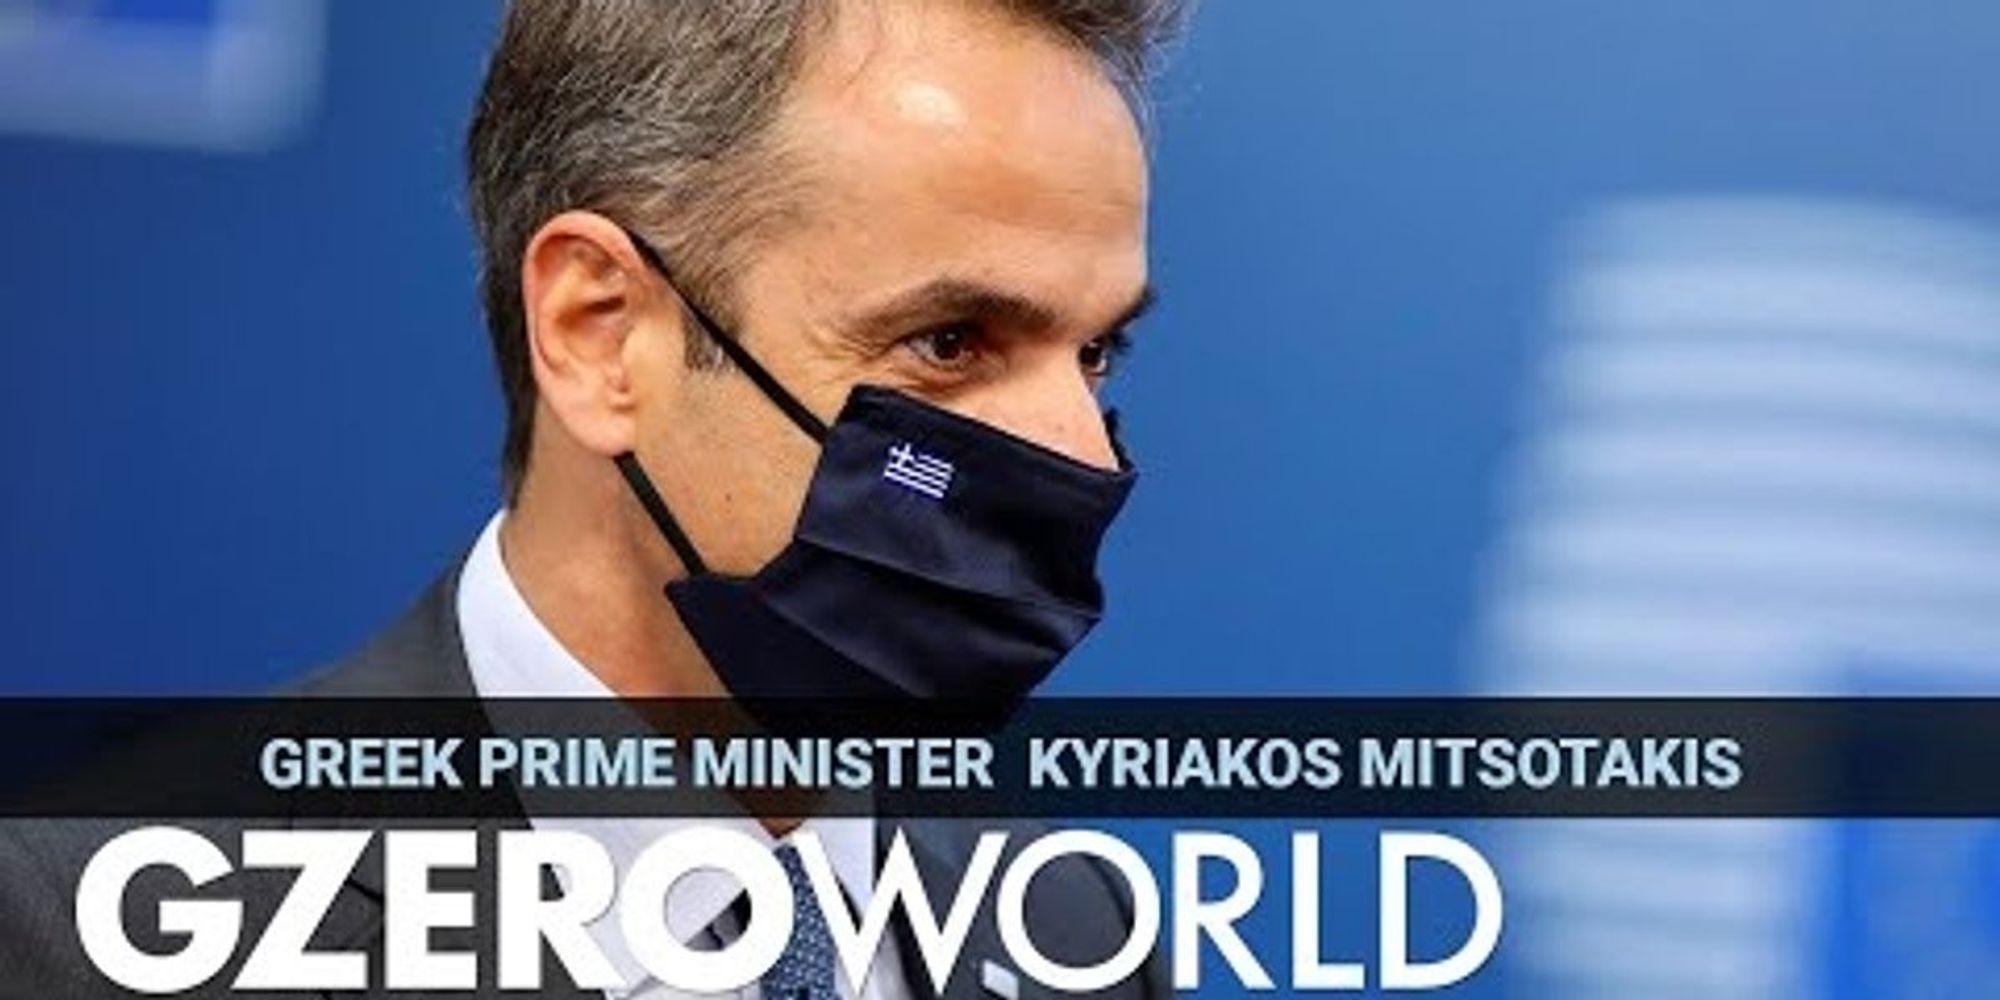 Greece's unlikely COVID success story: Greek PM Kyriakos Mitsotakis